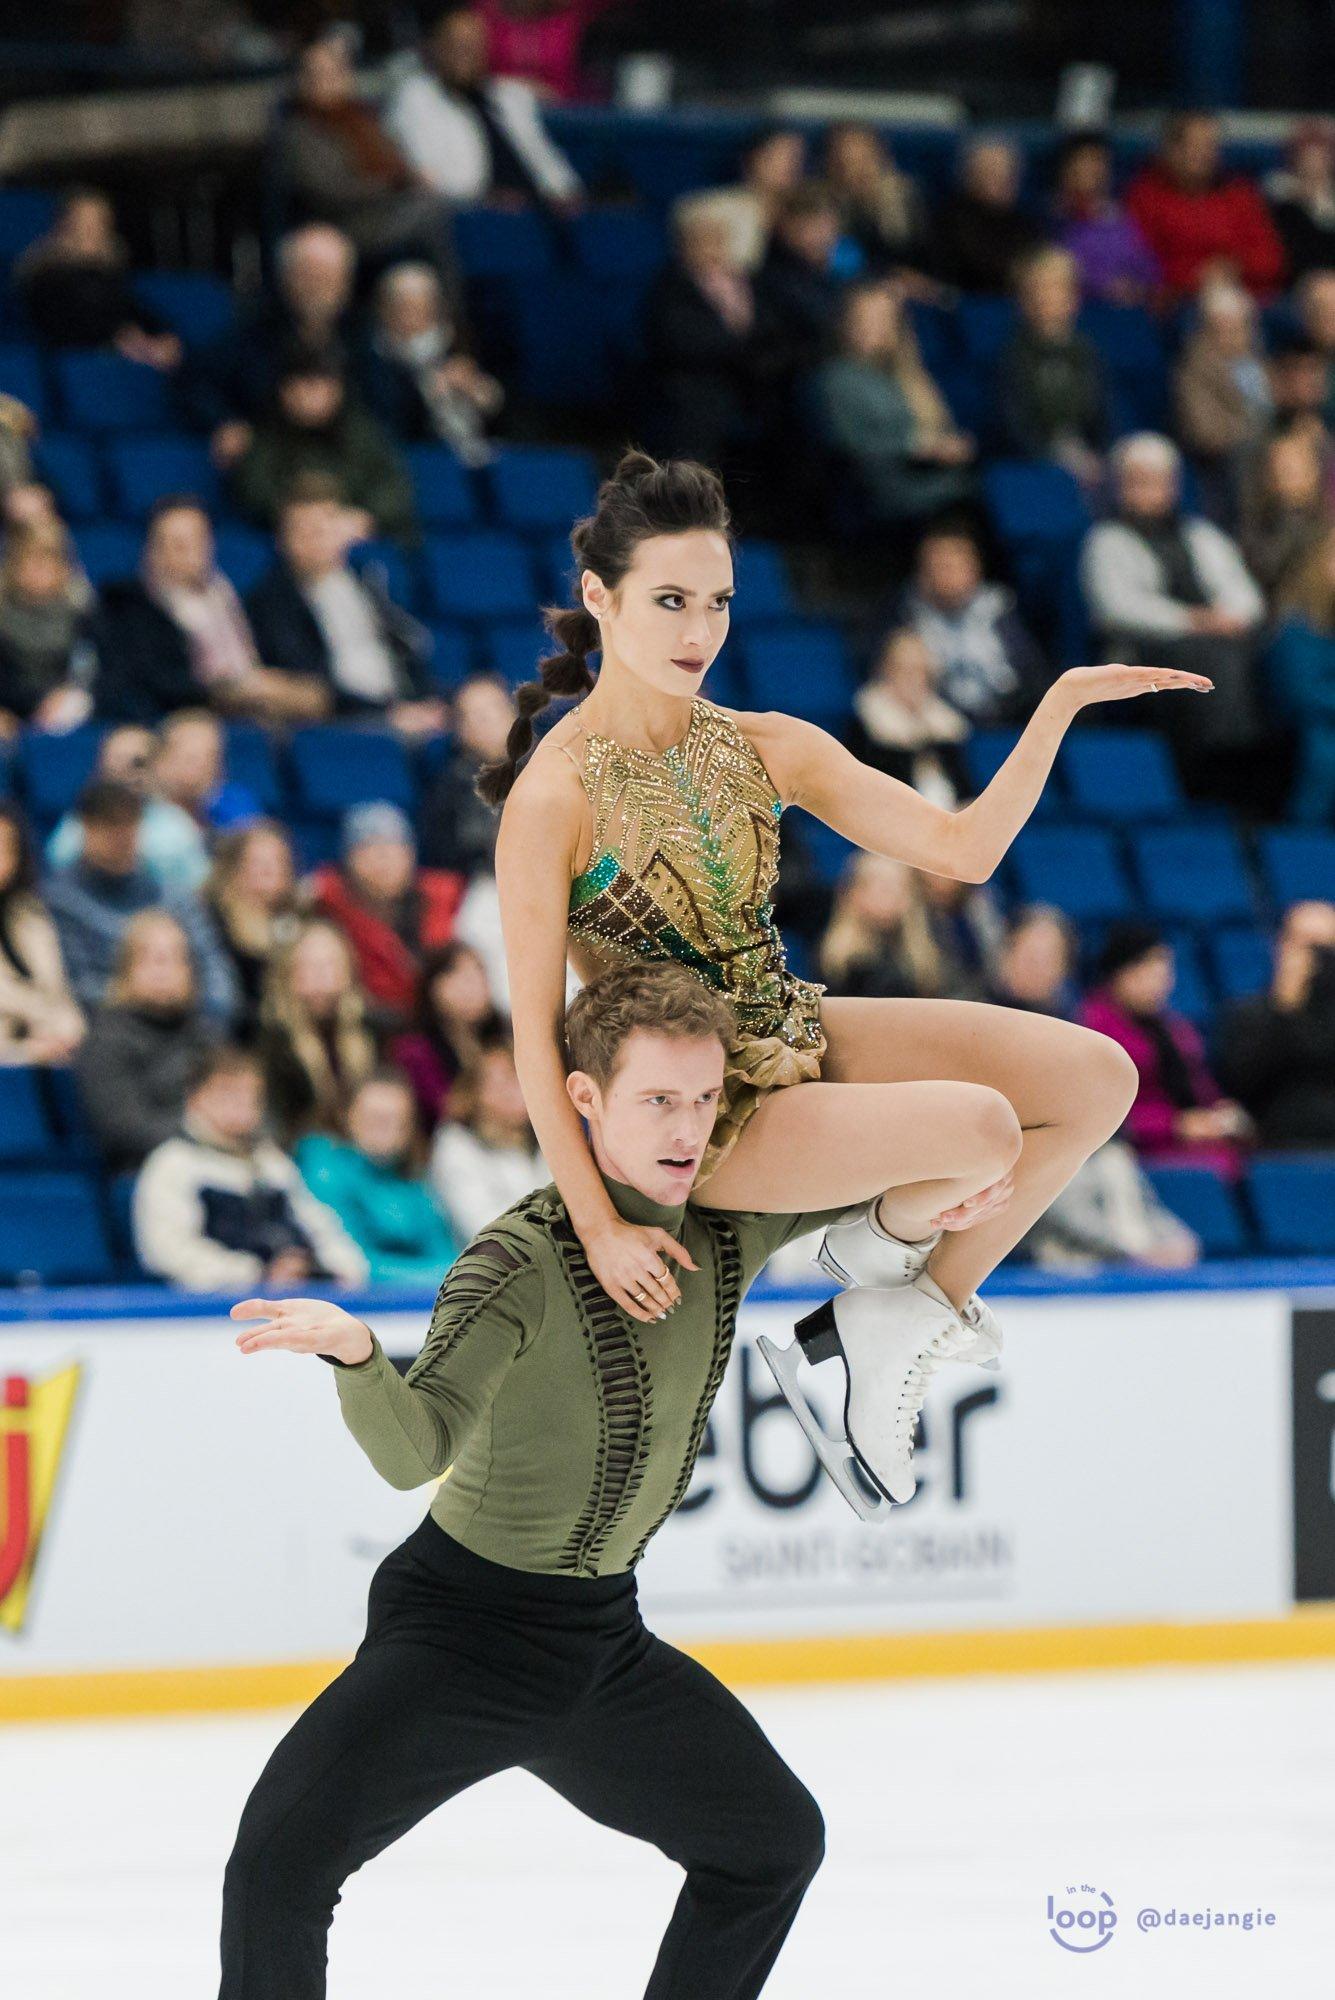 Challenger (6) - Finlandia Trophy. Oct 11 - 13, 2019. Espoo /FIN      - Страница 13 EG3MAiBXkAA7gfq?format=jpg&name=large